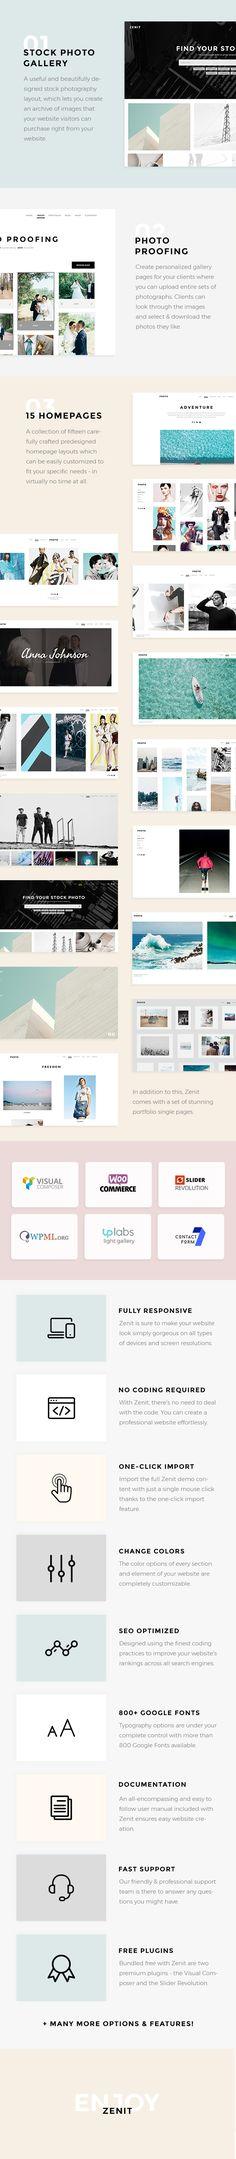 Zenit - A Crisp and Clean Photography Wordpress Theme #minimal #personal #photo